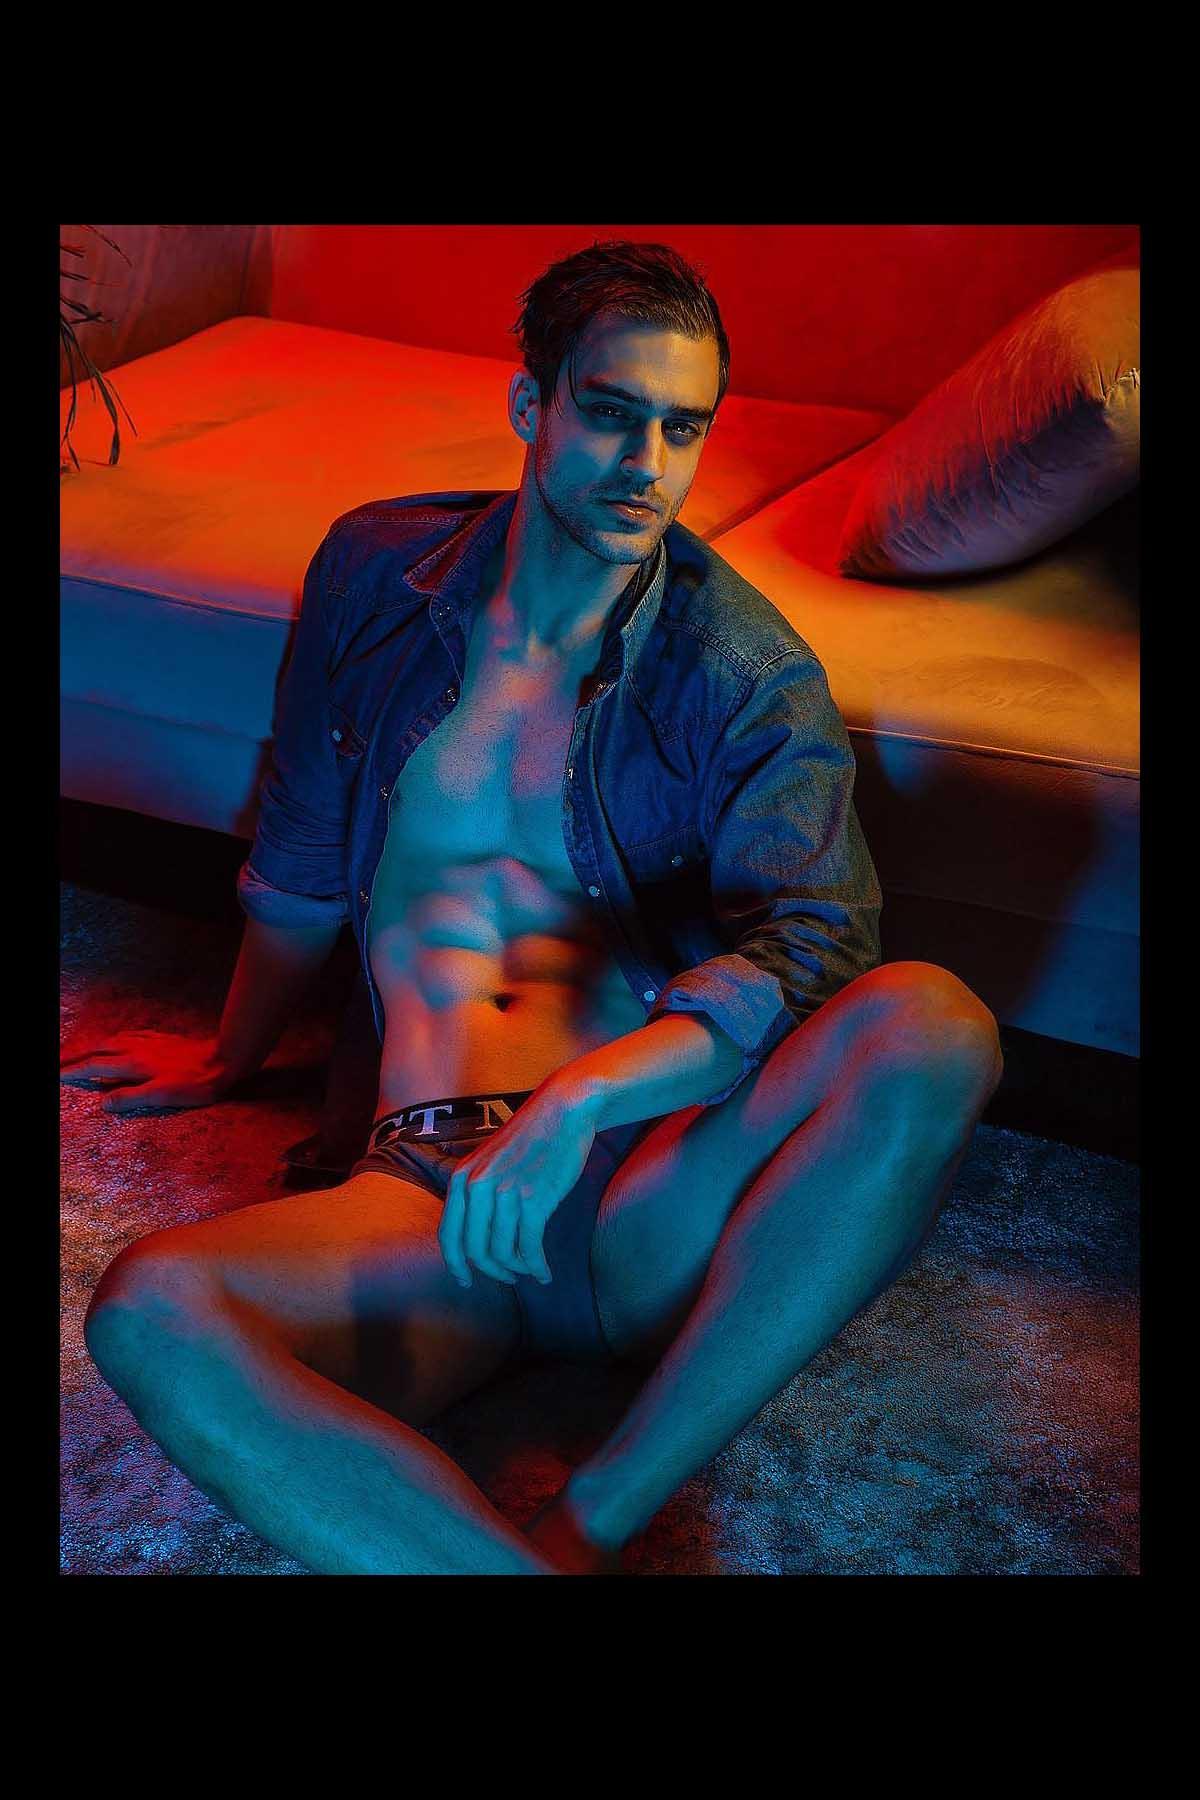 Matheus Riehl by Alejandro Salinas for Brazilian Male Model